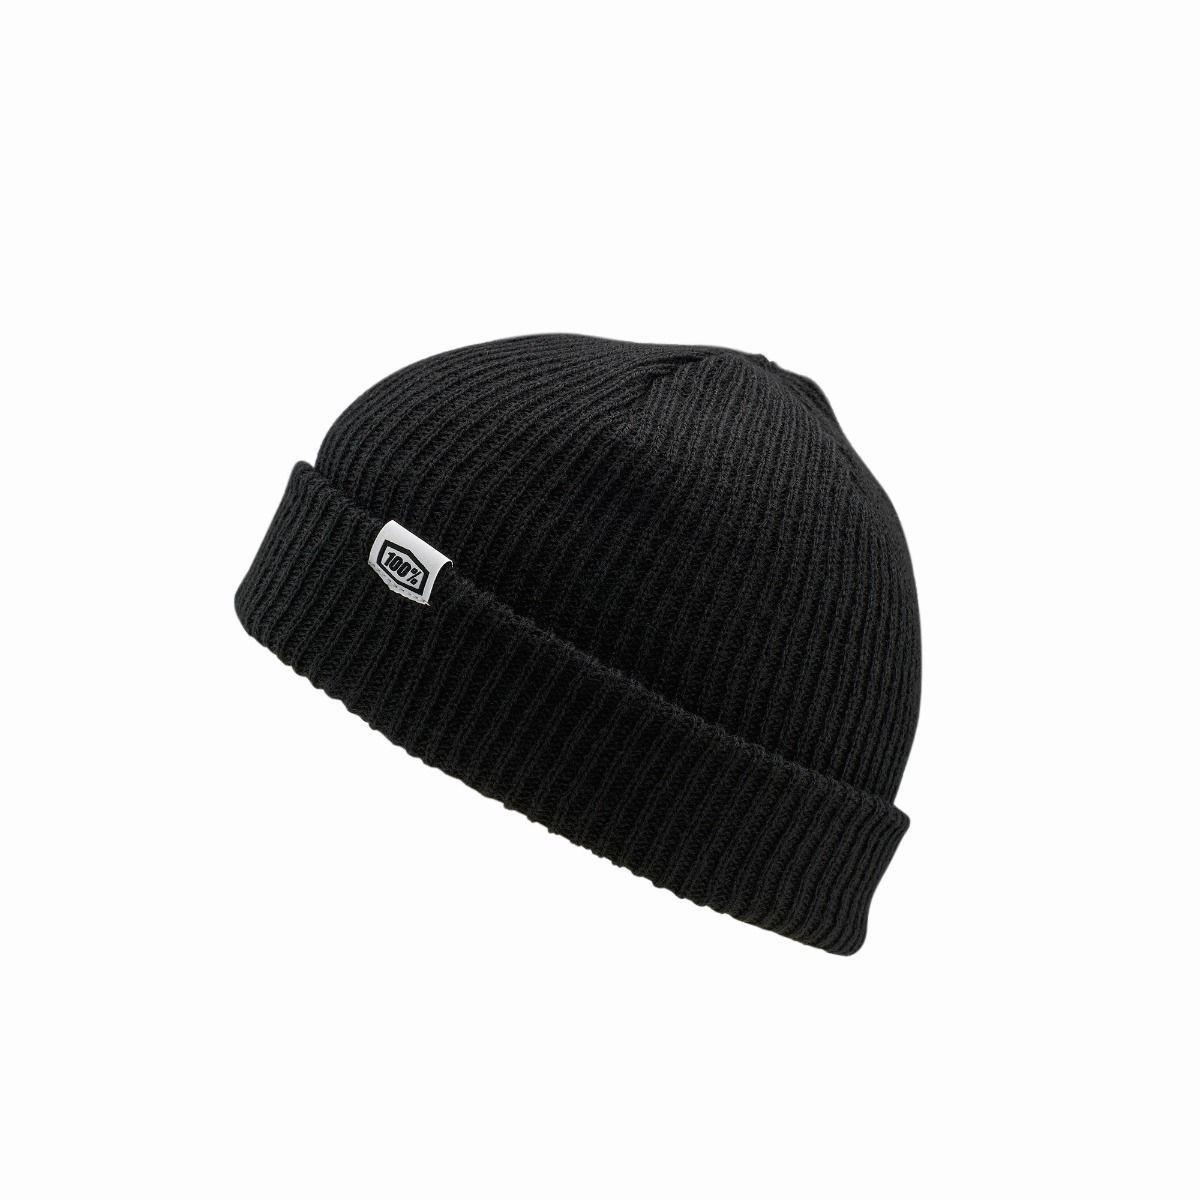 100% Mutiny Cuff Beanie | Headwear